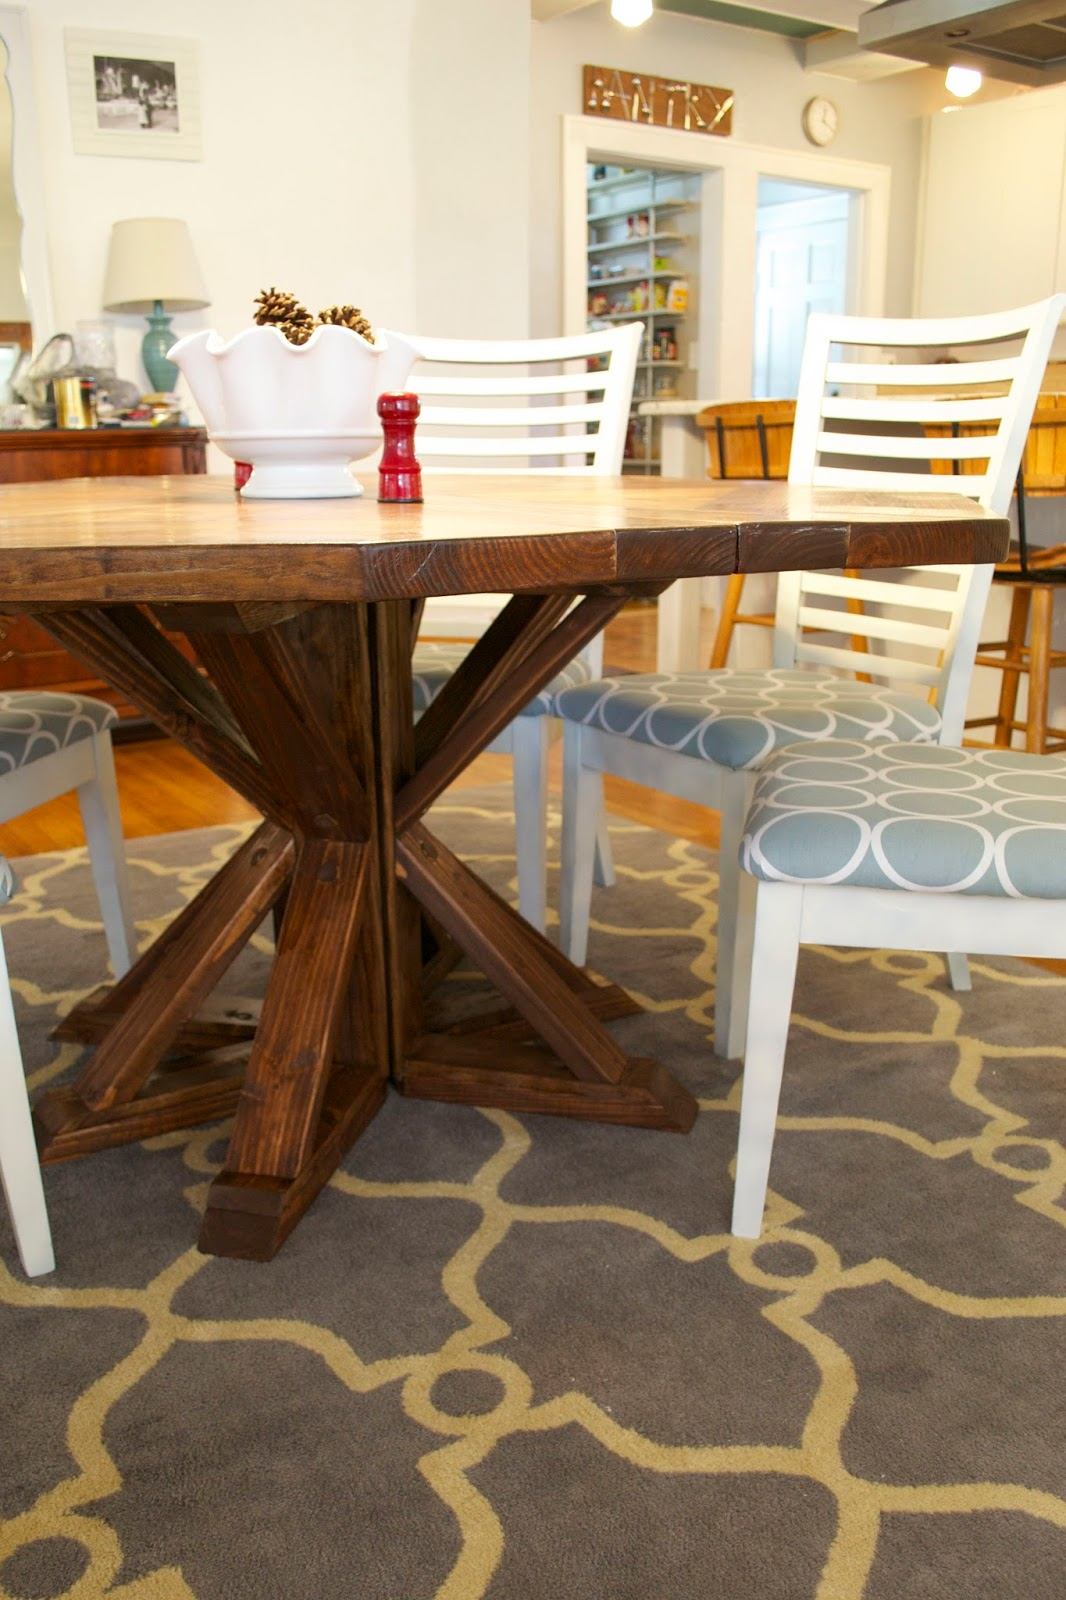 Ck And Nate Header Restoration Hardware Diy Dining Table